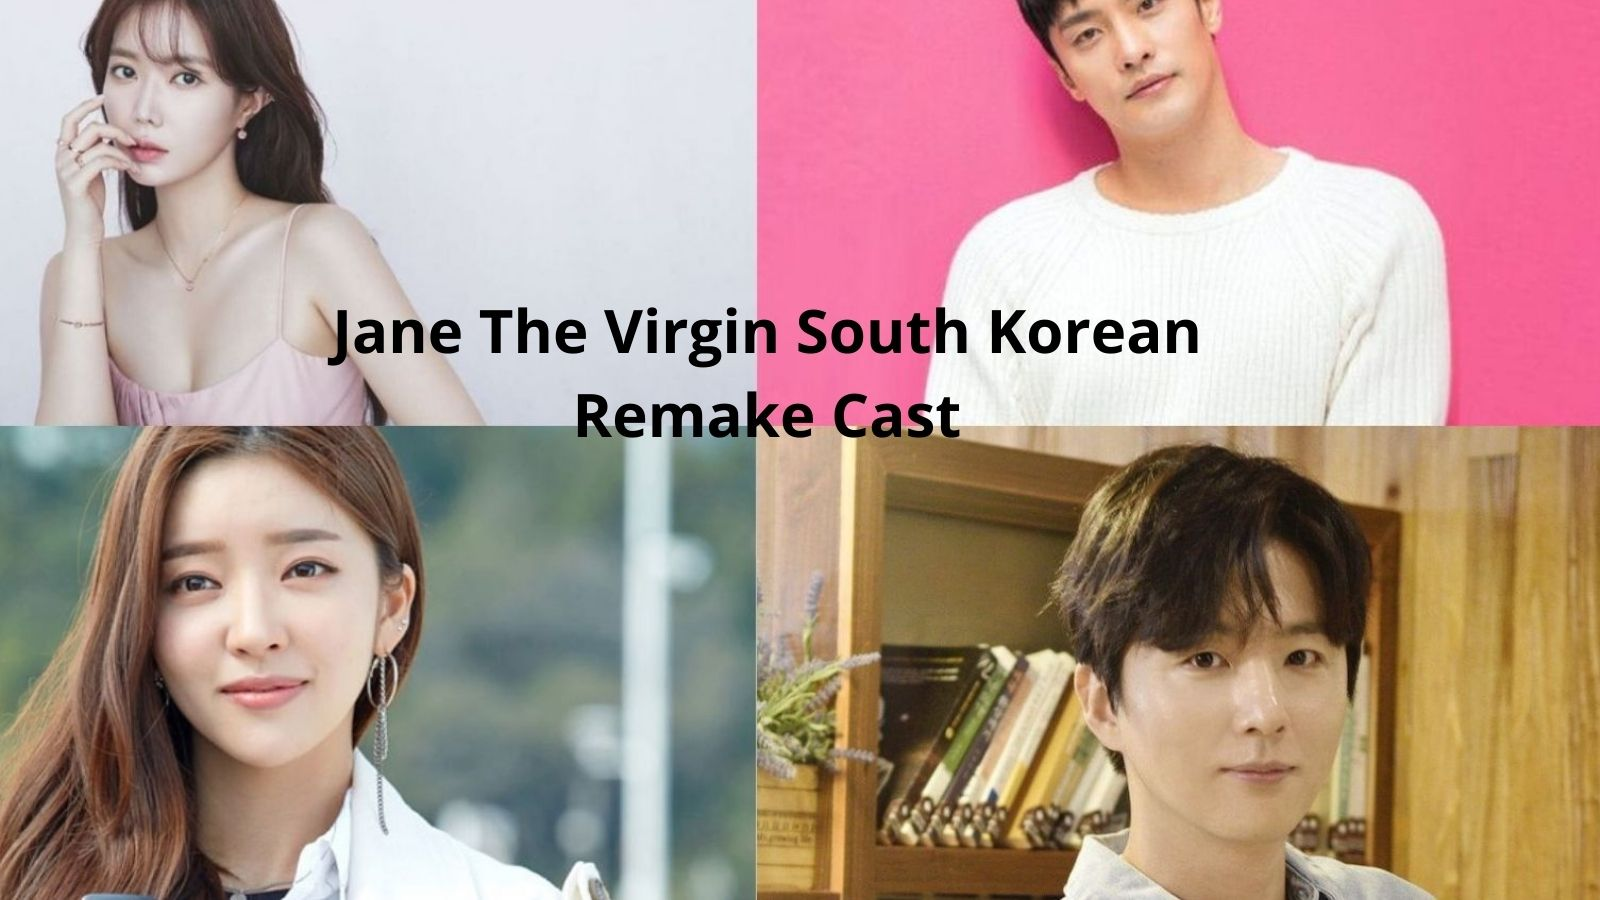 Jane The Virgin South Korean Remake Cast